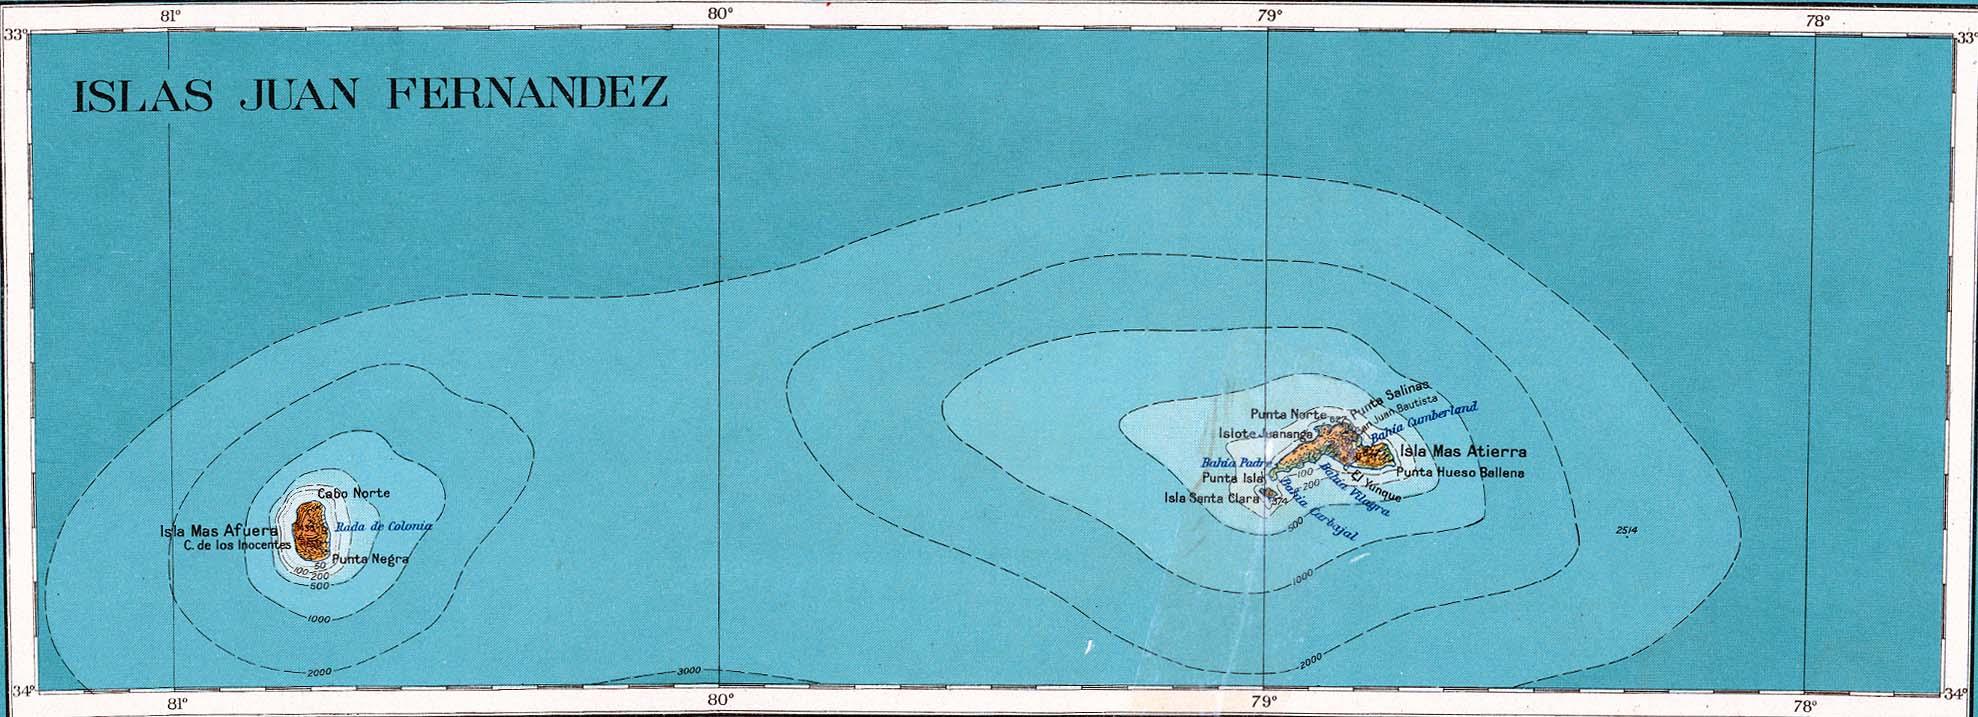 Juan Fernandez isla Mapa topográfico 1927.